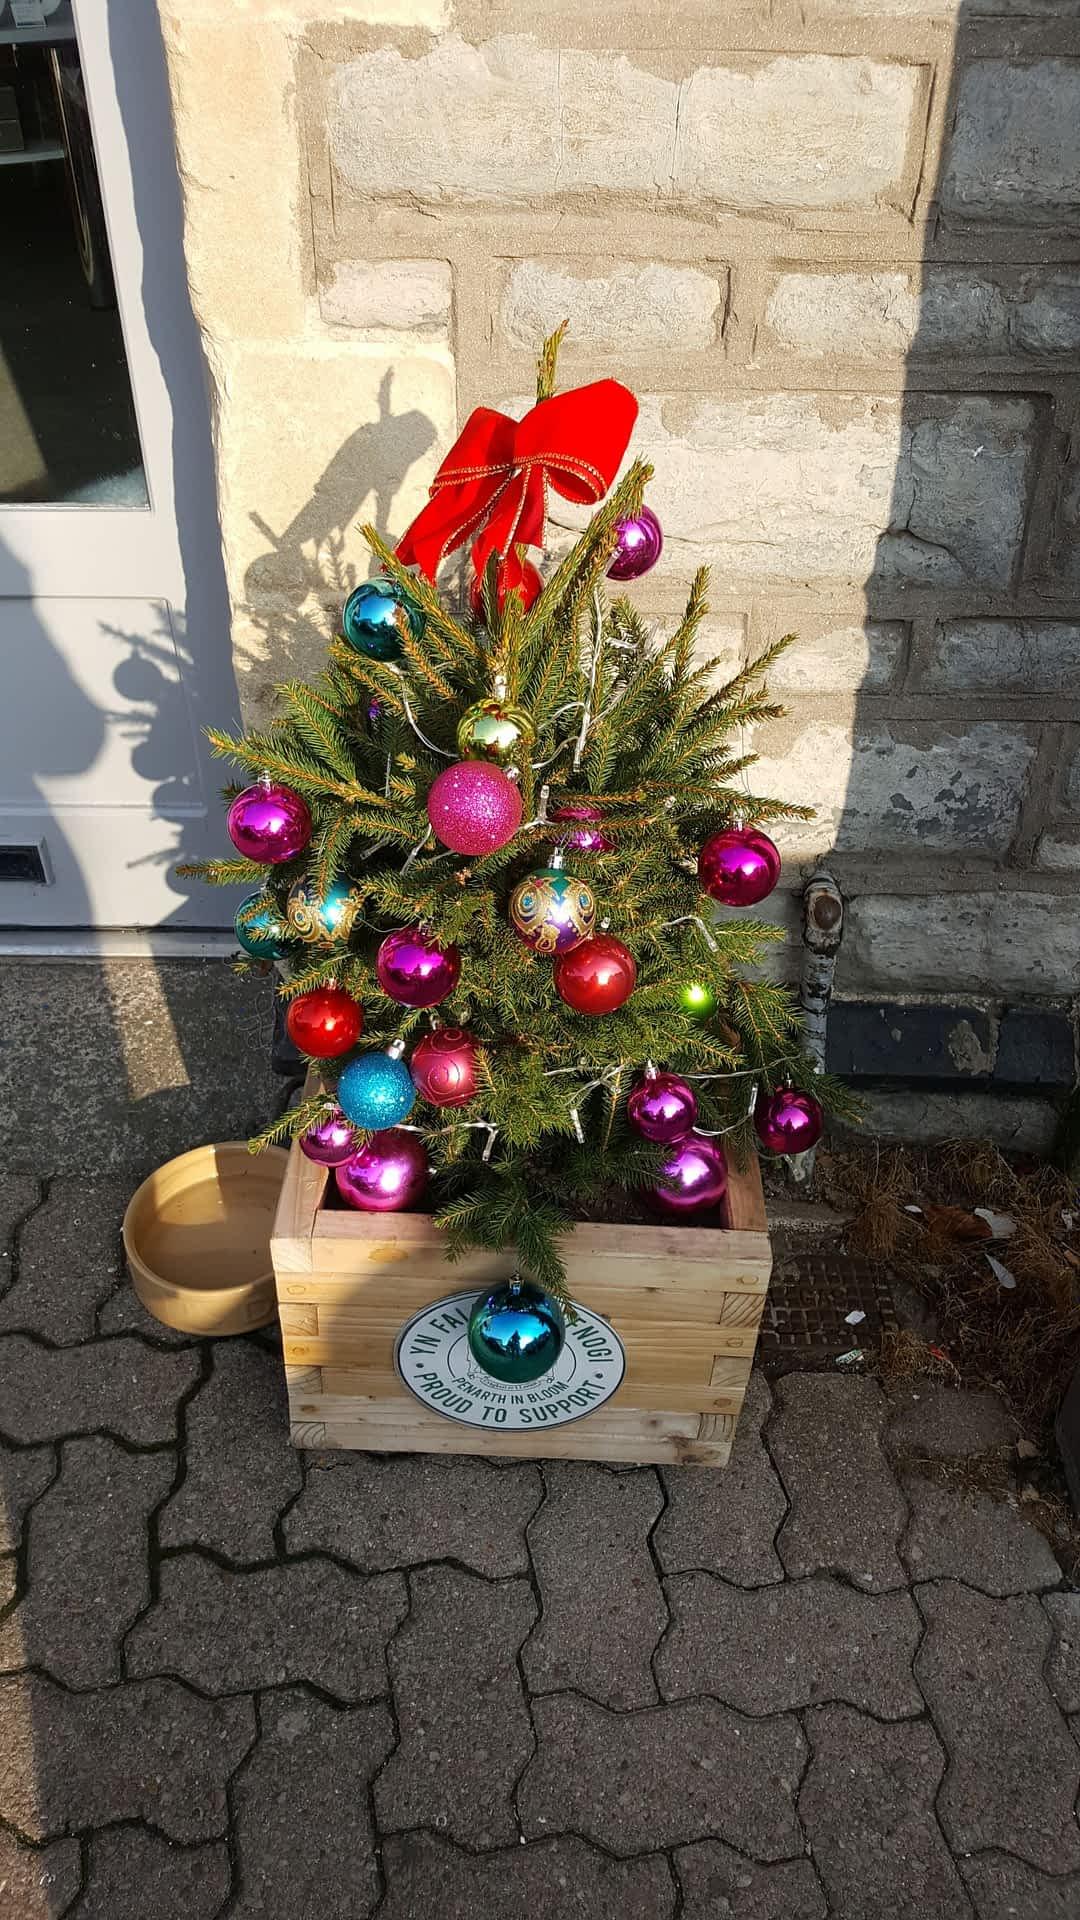 Christmas Tree Recycle Design.Christmas Tree Recycling Monday 14 January Friday 18 January 2019 Penarthtowncouncil Gov Uk